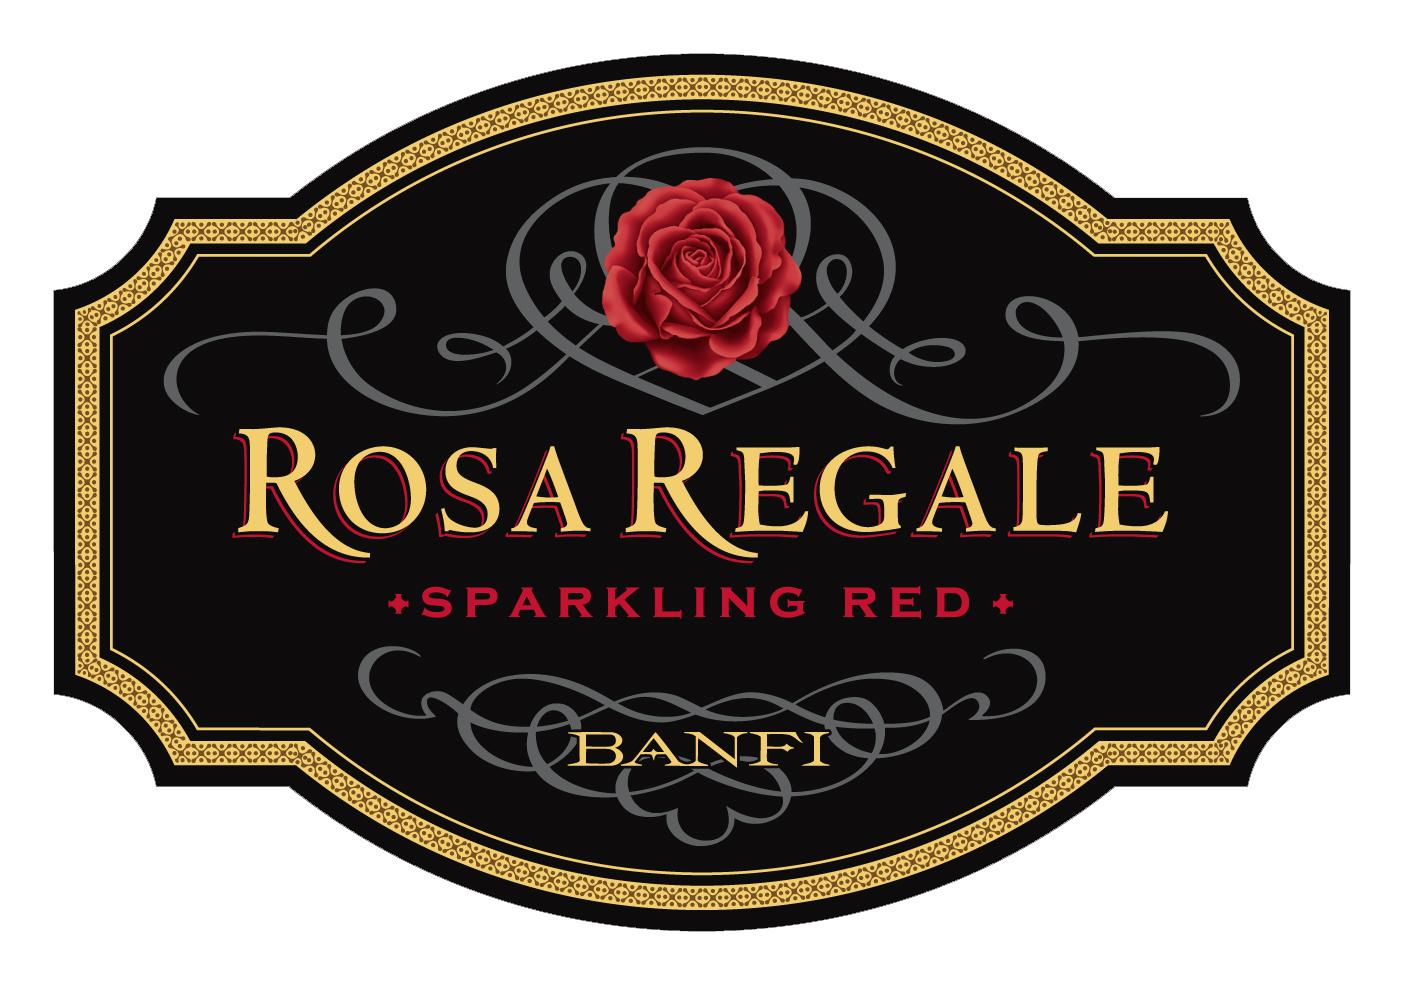 Rosa_Regale_Label.jpg